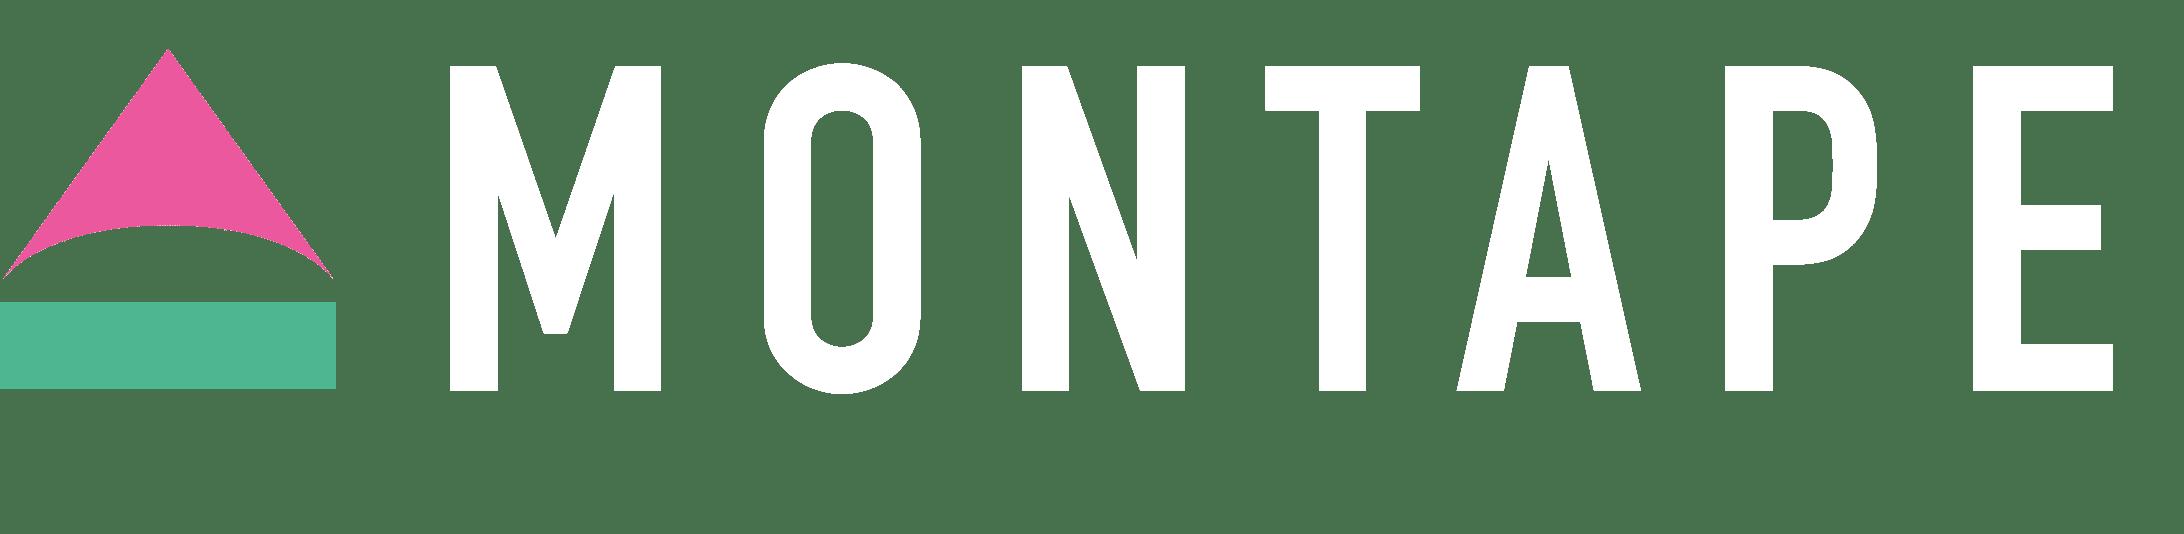 Montape